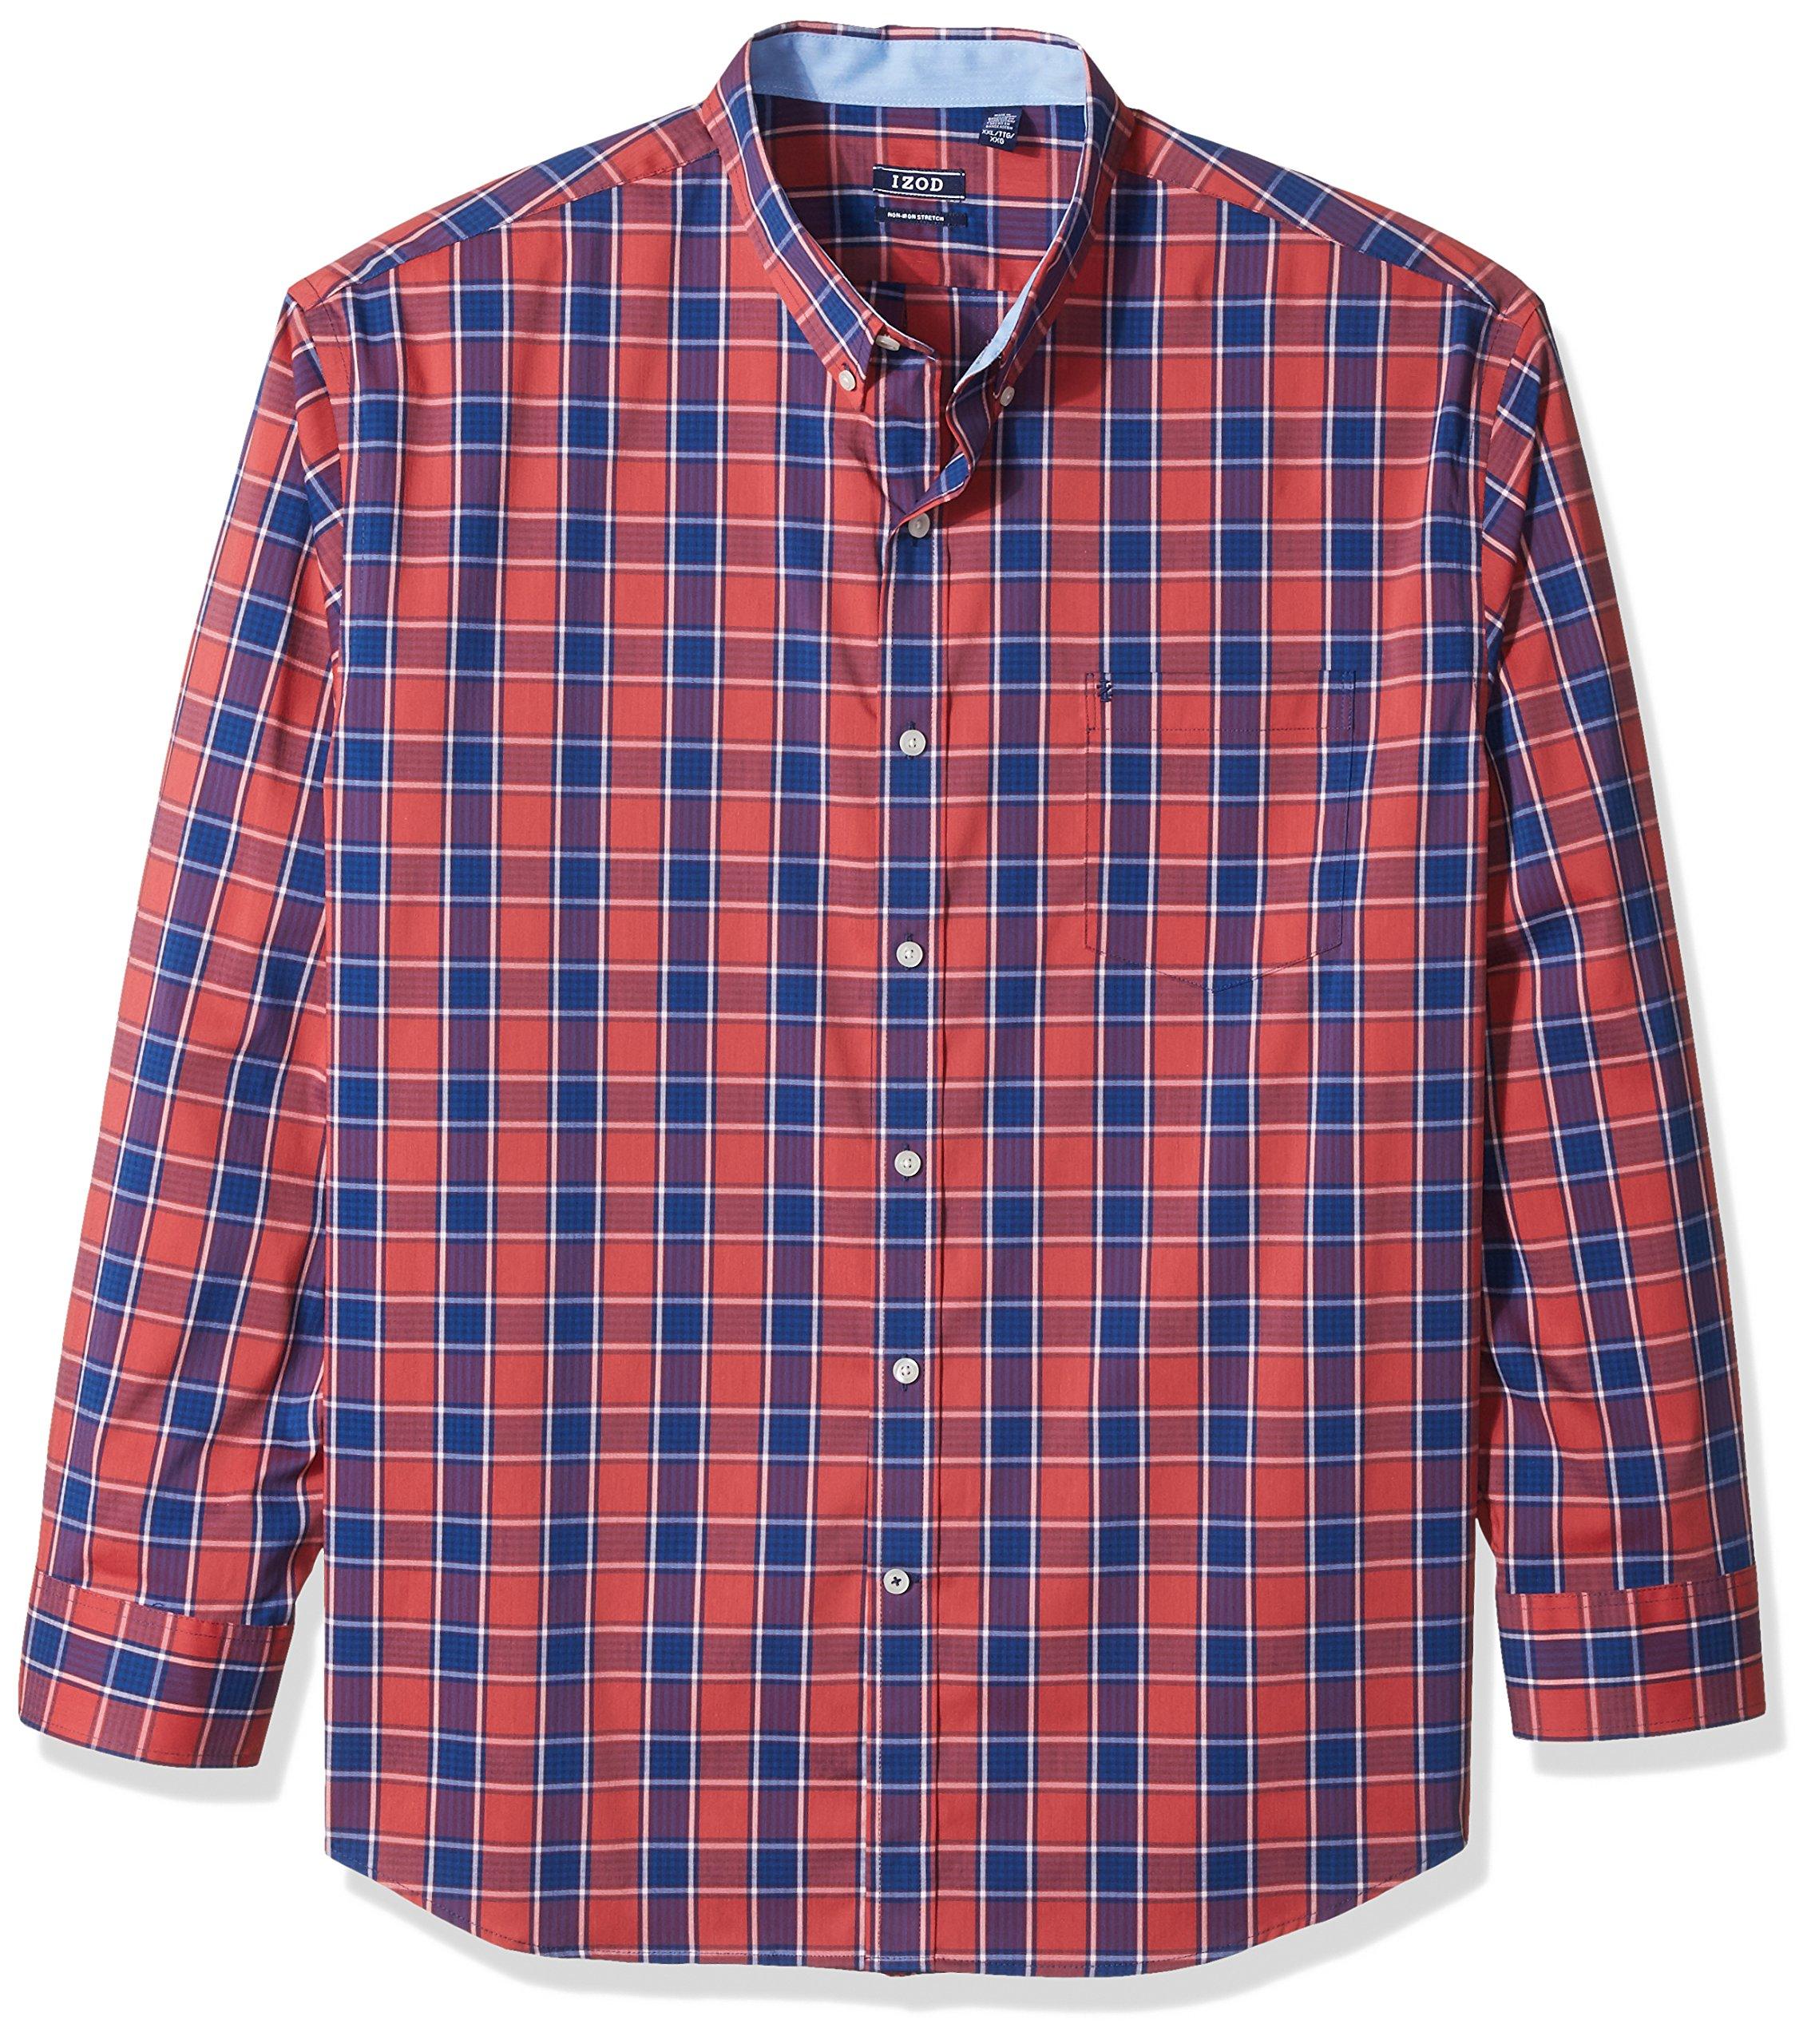 IZOD Men's Advantage Performance Non Iron Stretch Long Sleeve Shirt, Saltwater Red, XX-Large